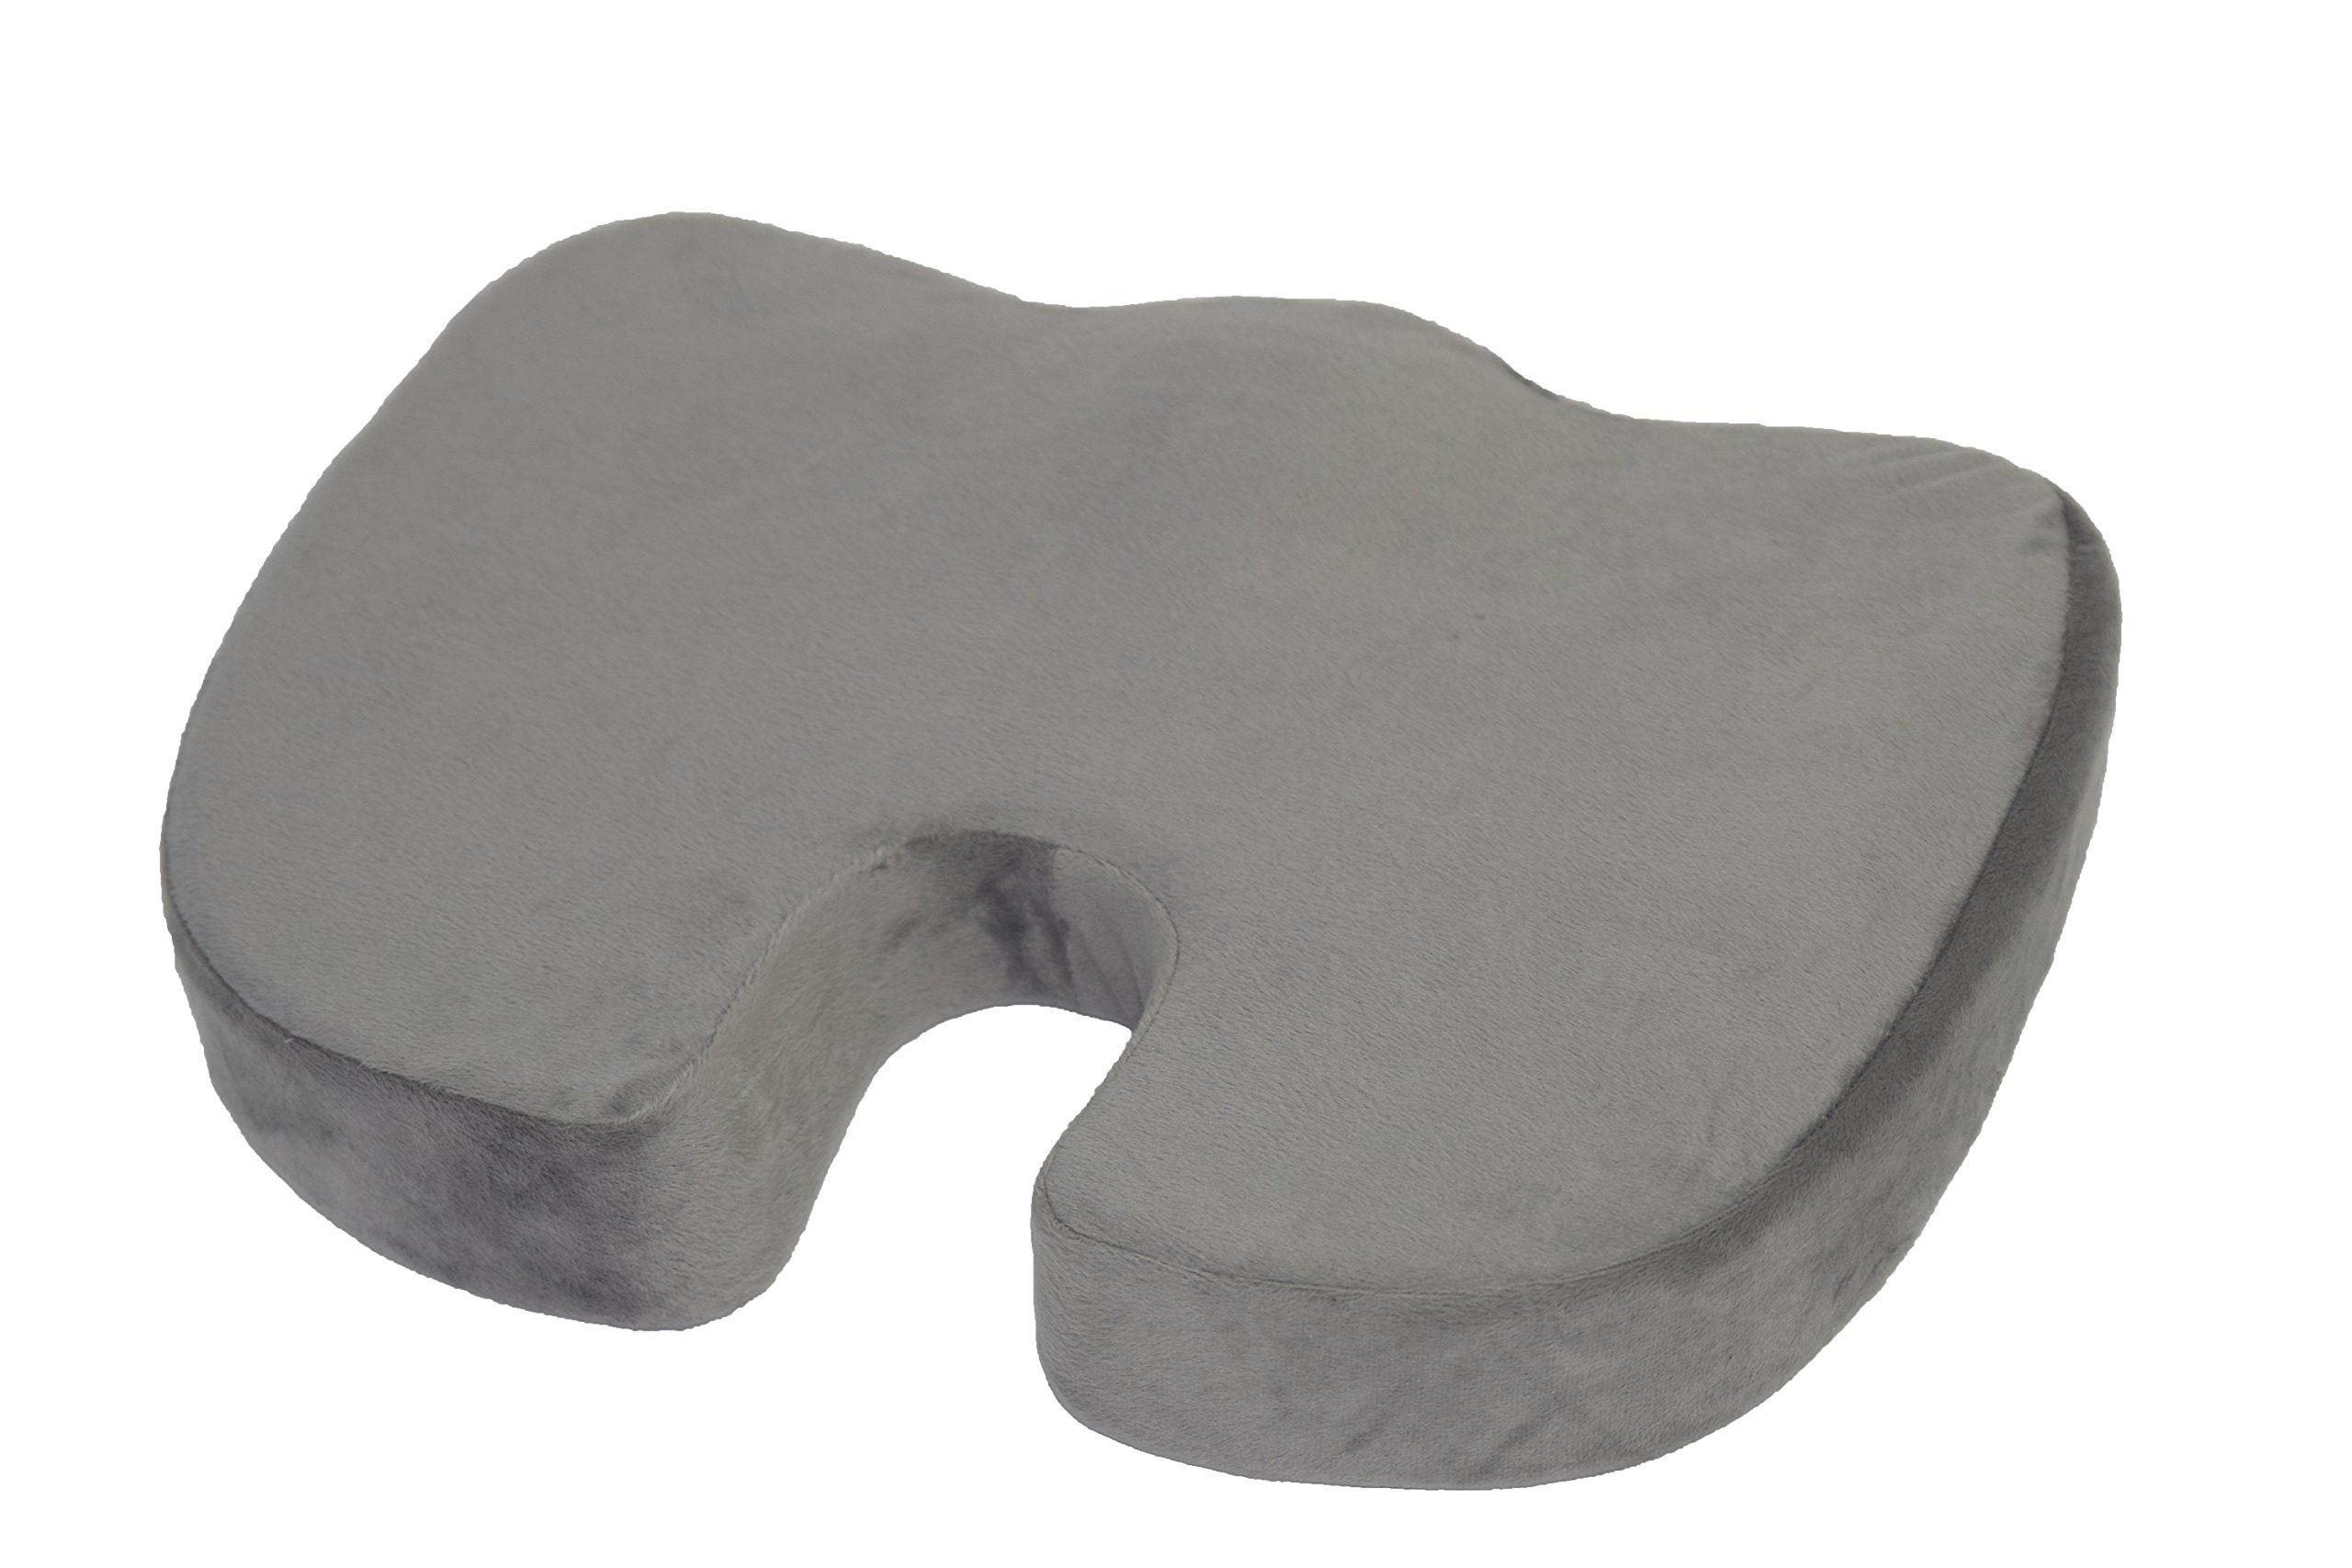 Coccyx Seat Cushion Cool Gel Memory Foam Orthopedic Cushion